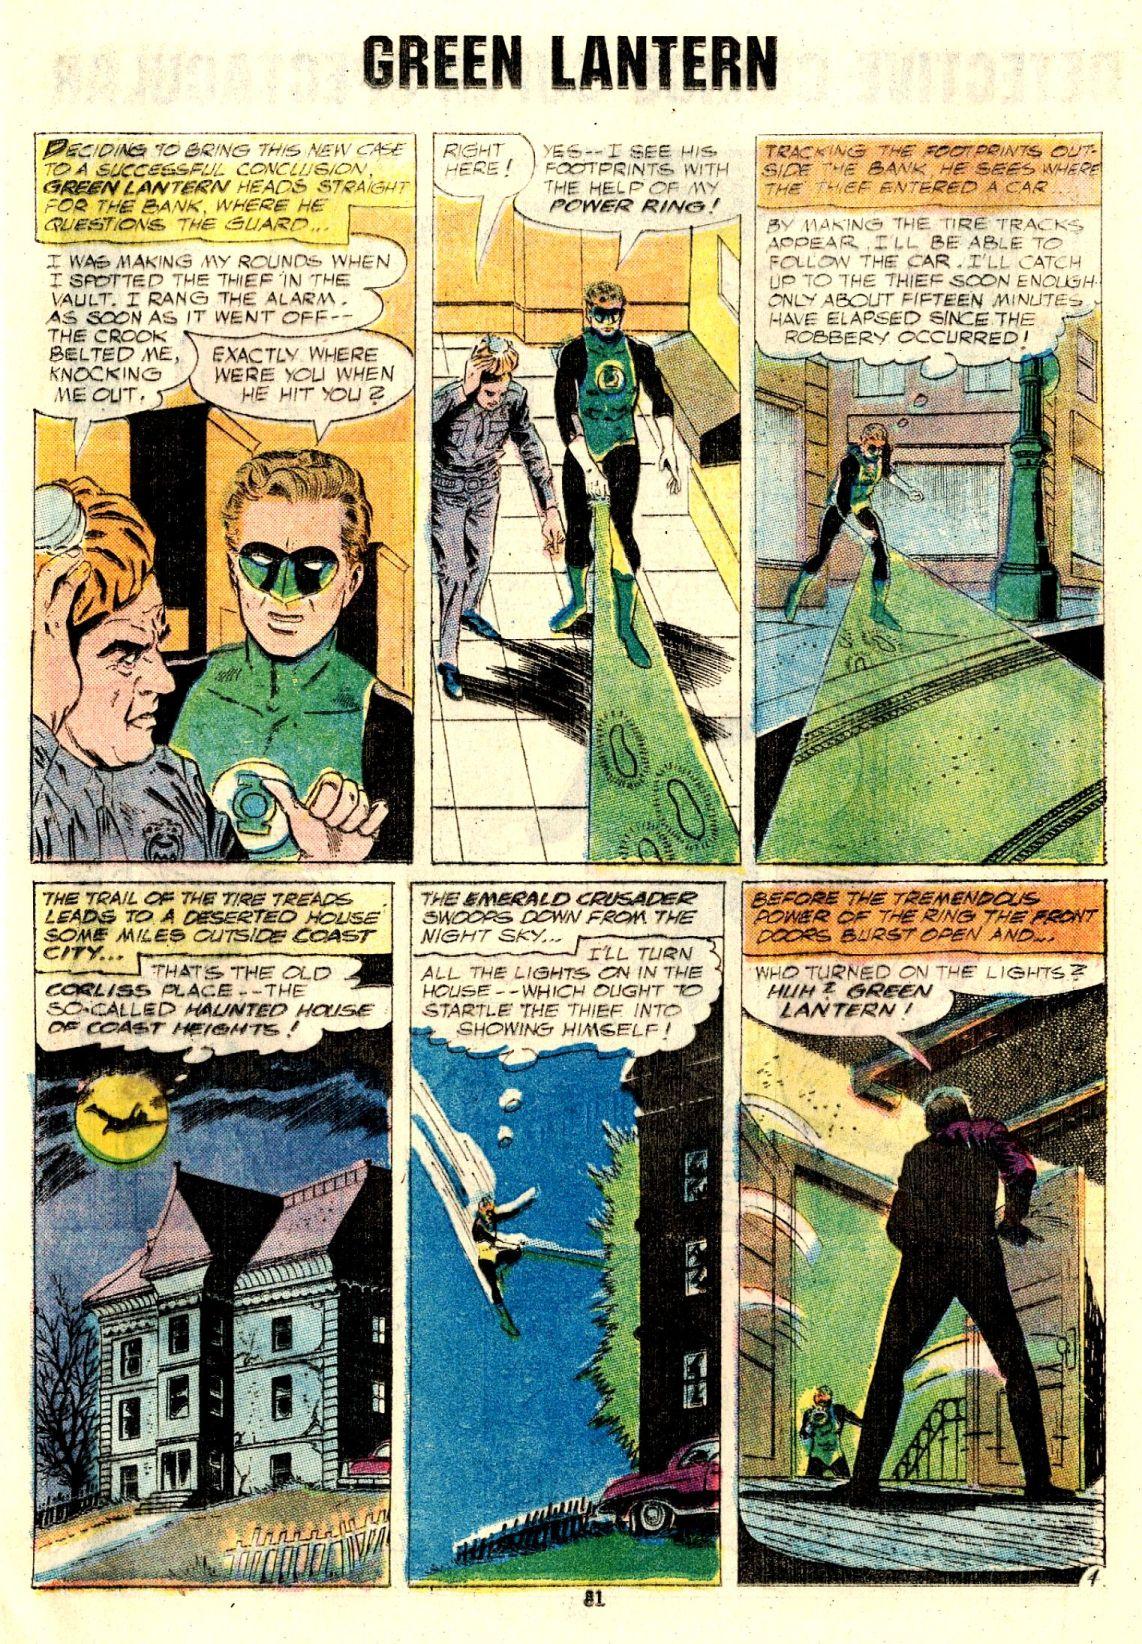 Detective Comics (1937) 438 Page 81